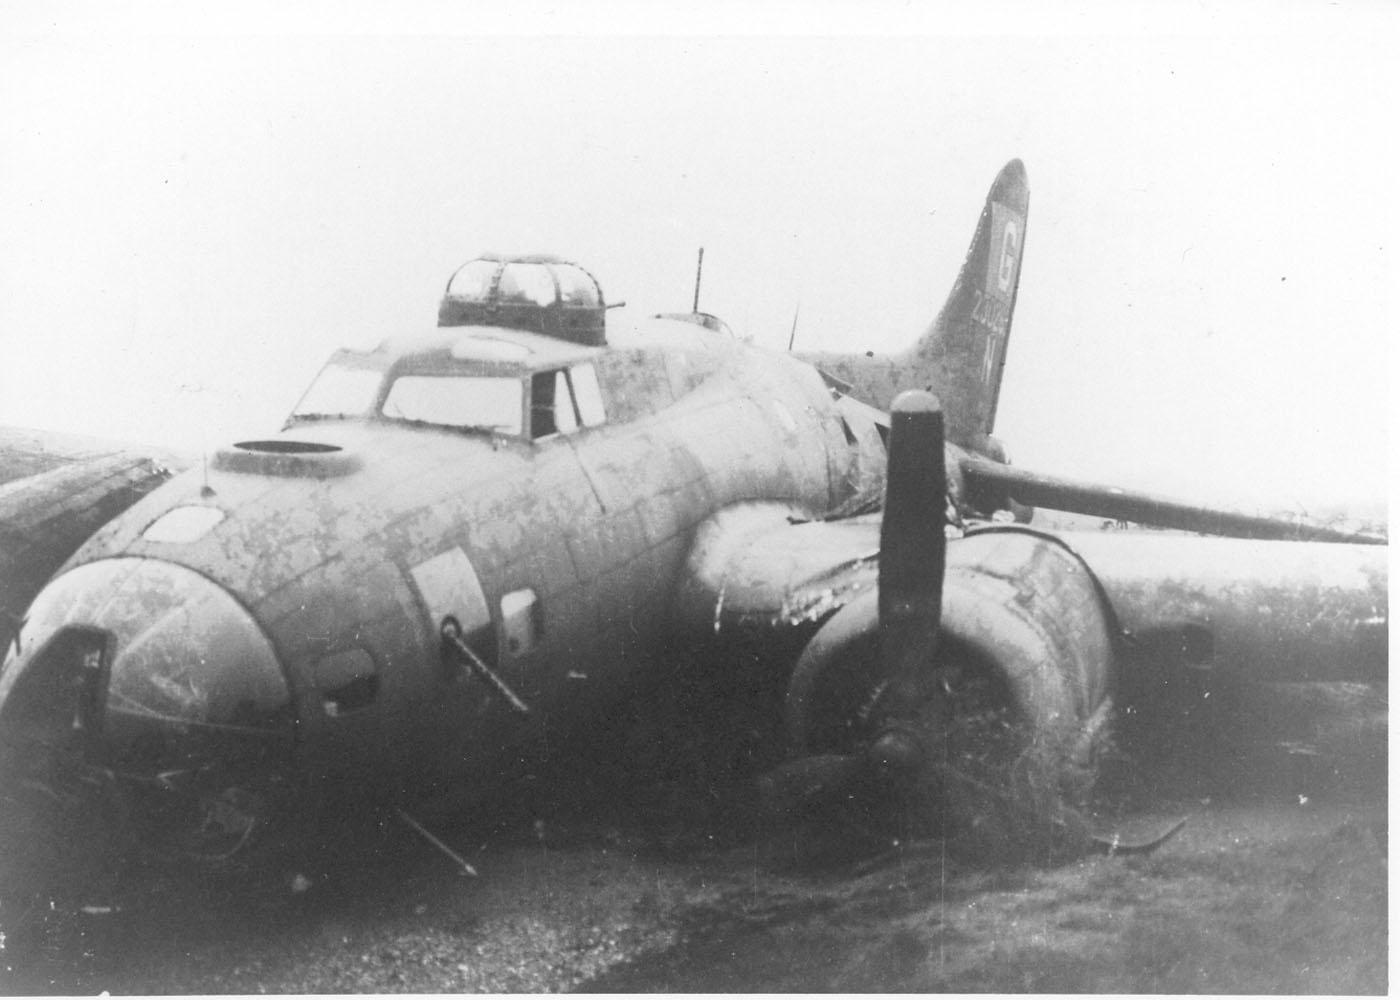 B-17 42-30263